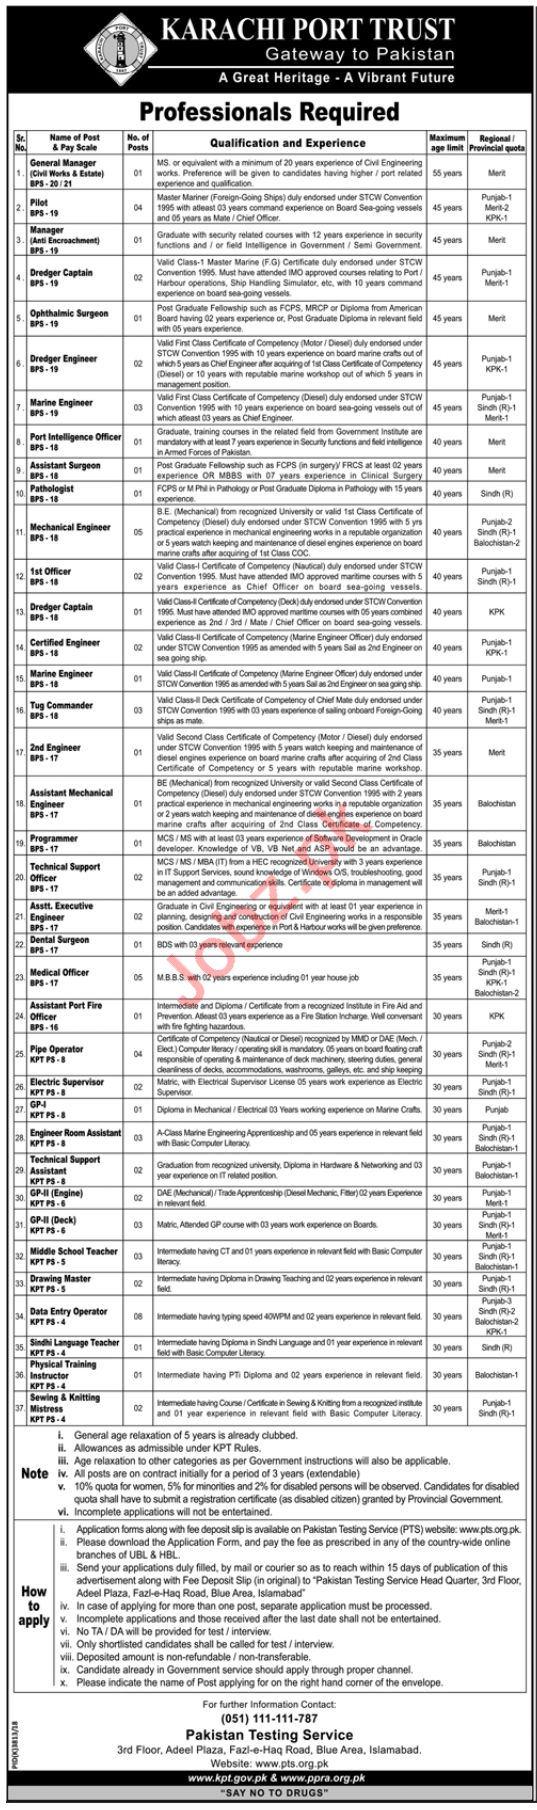 Karachi Port Trust Management Jobs 2019